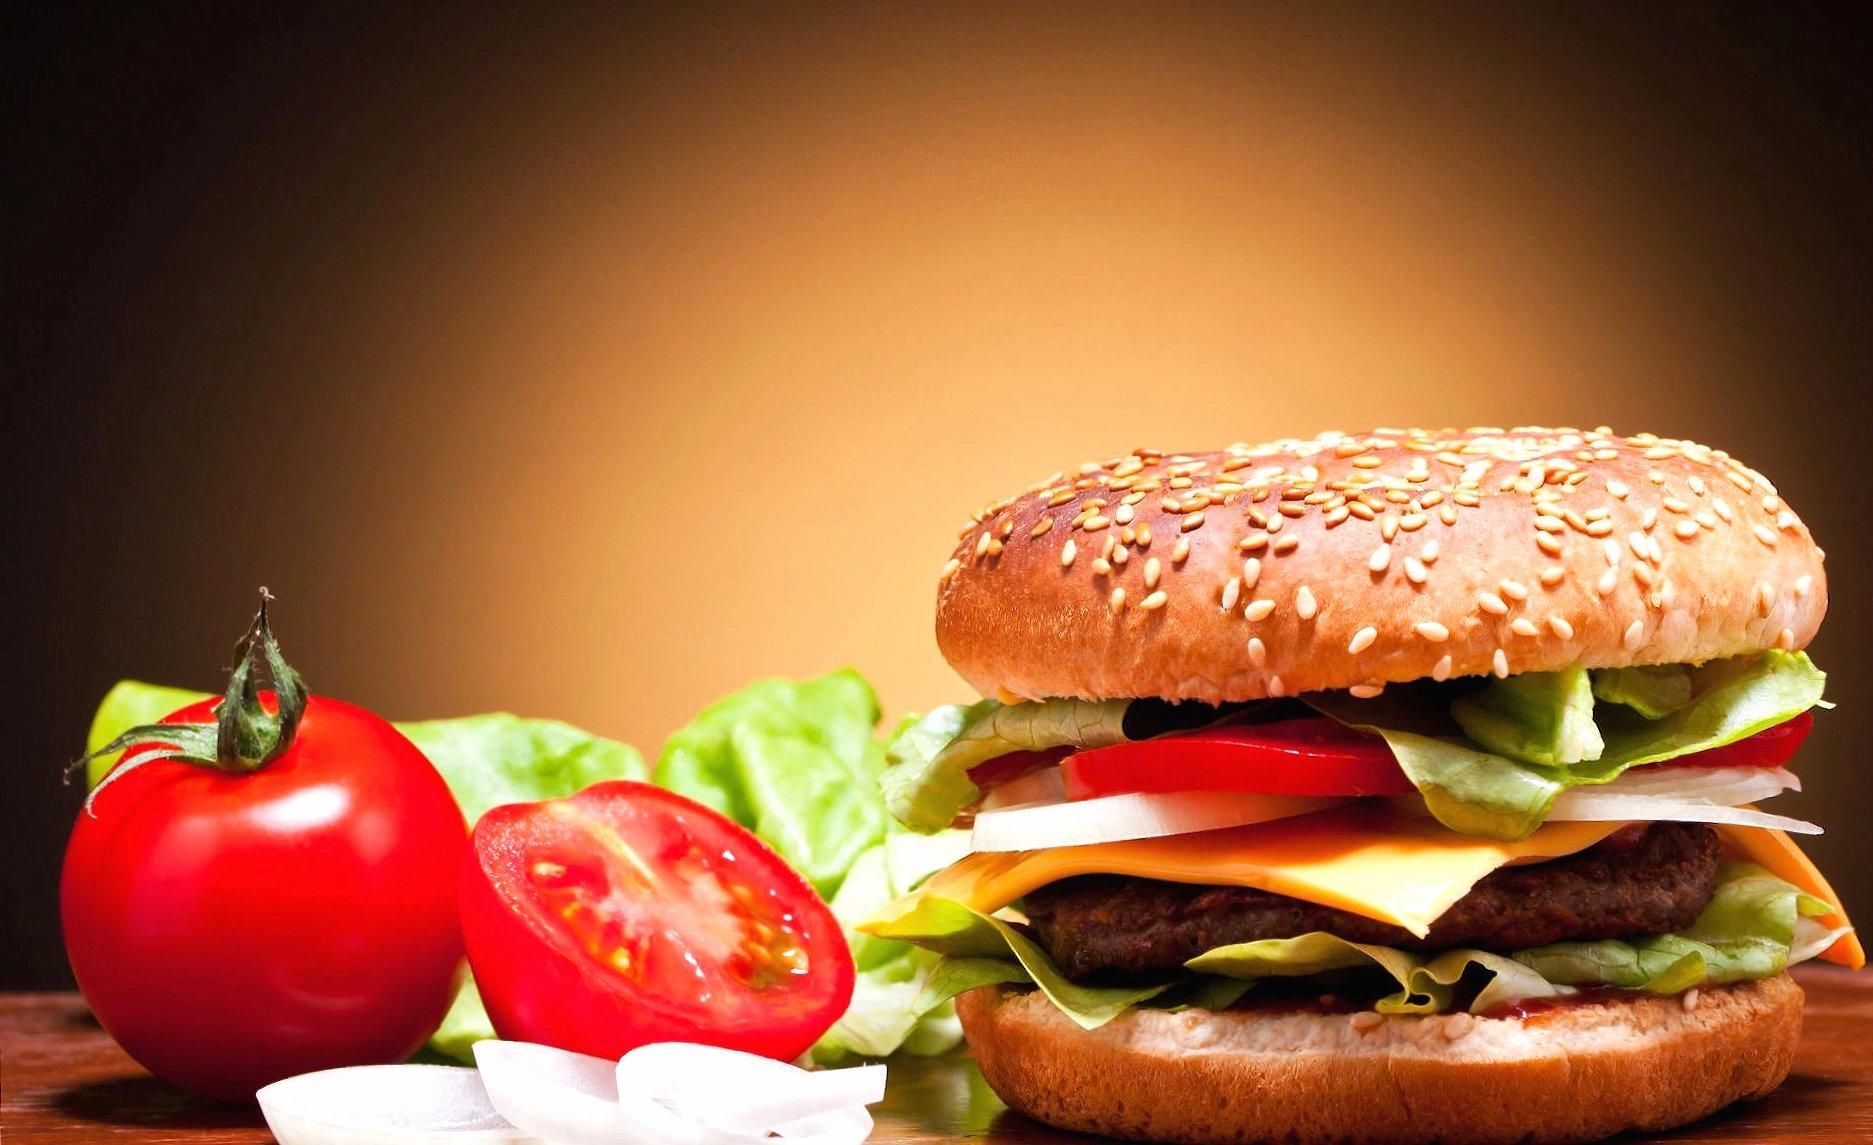 Amazing hamburger wallpapers HD quality